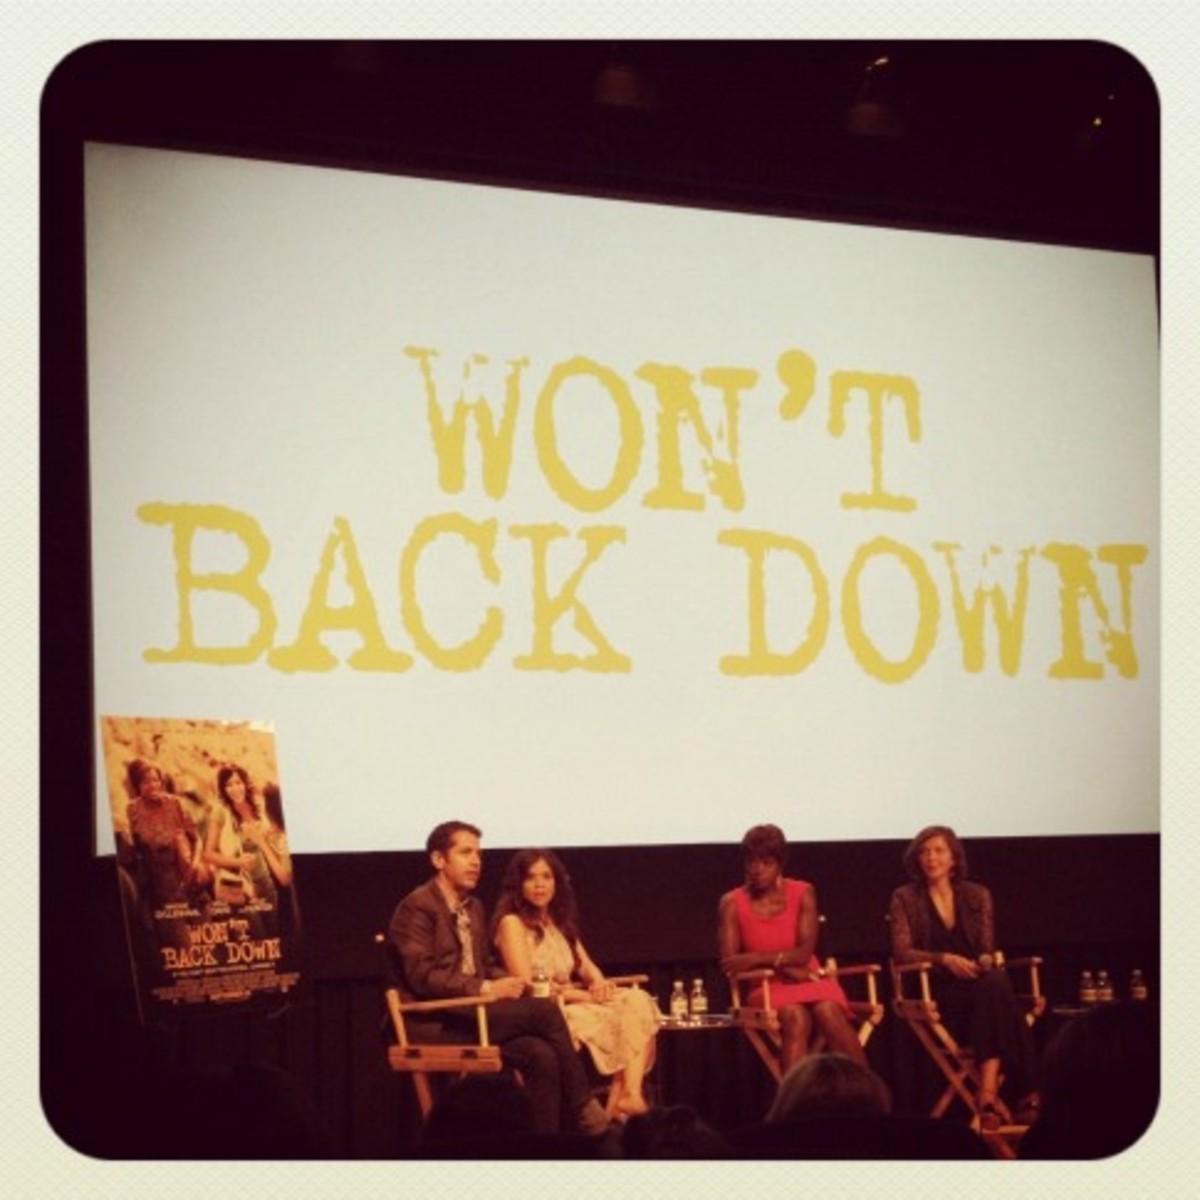 From L to R: Daniel Barnz, Rosie Perez, Viola Davis, and Maggie Gyllenhaal.